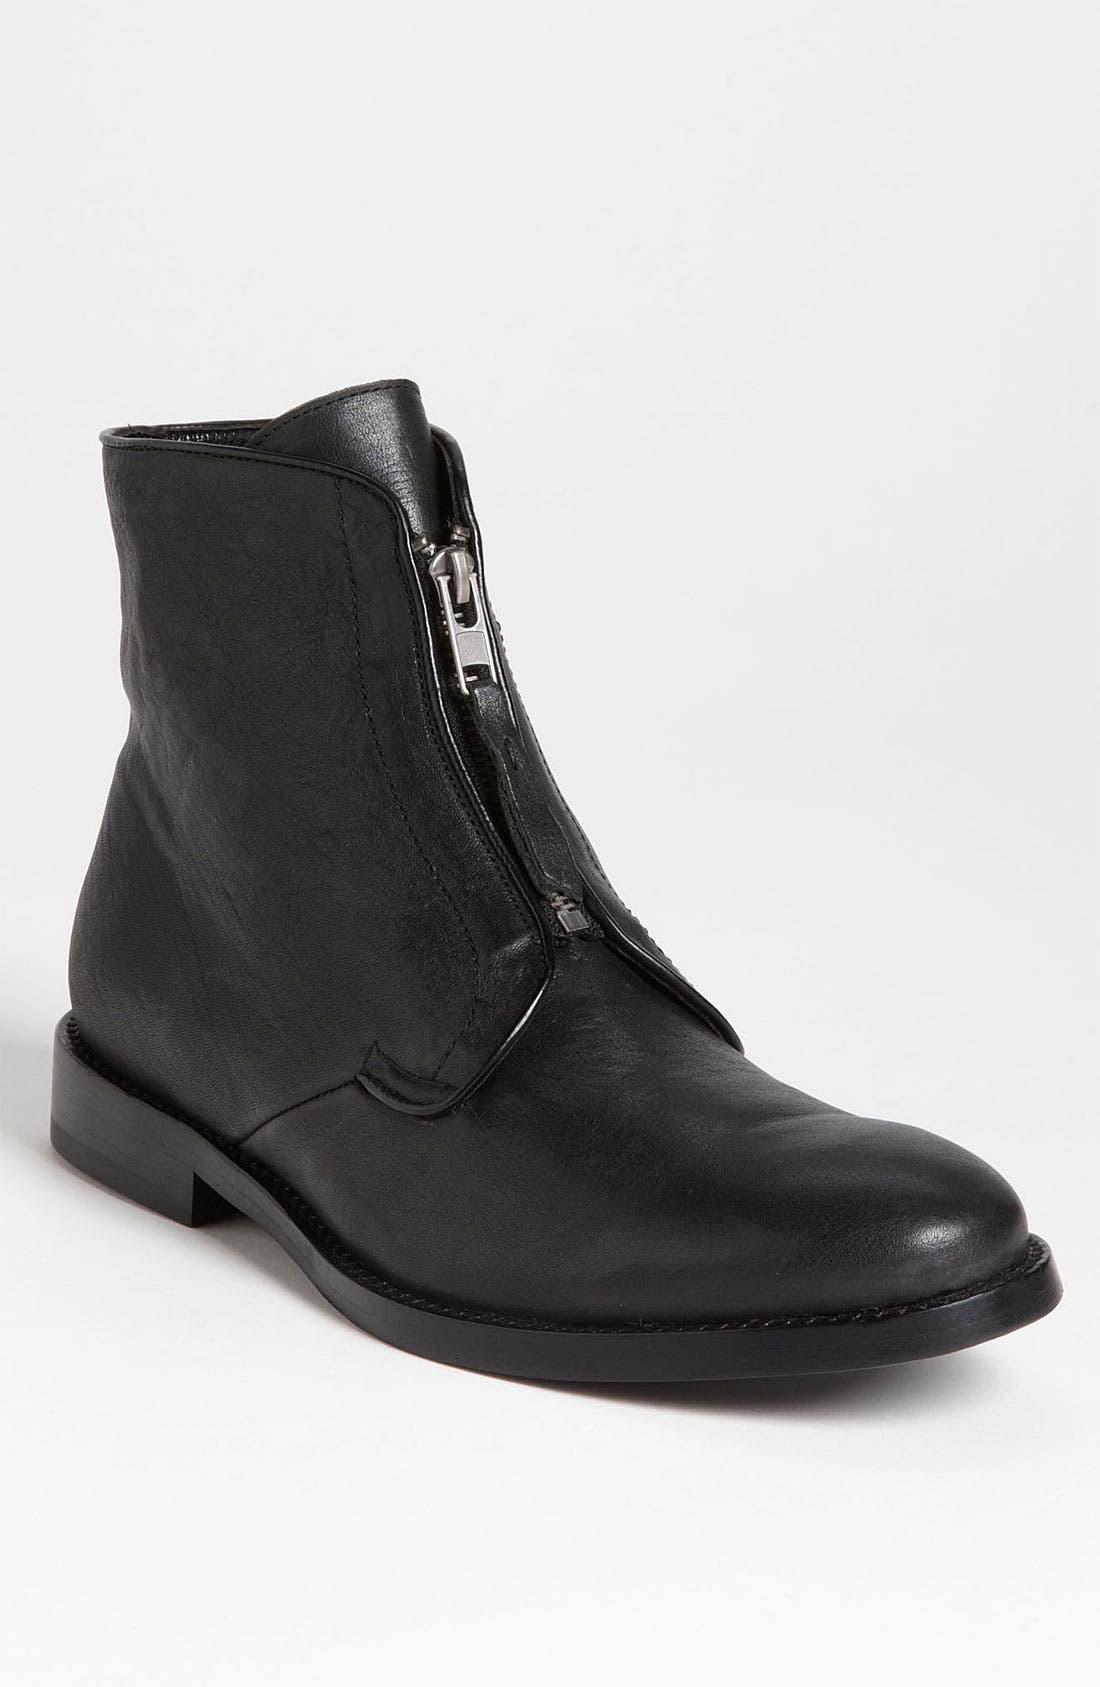 Main Image - Maison Forte 'Raphael' Boot